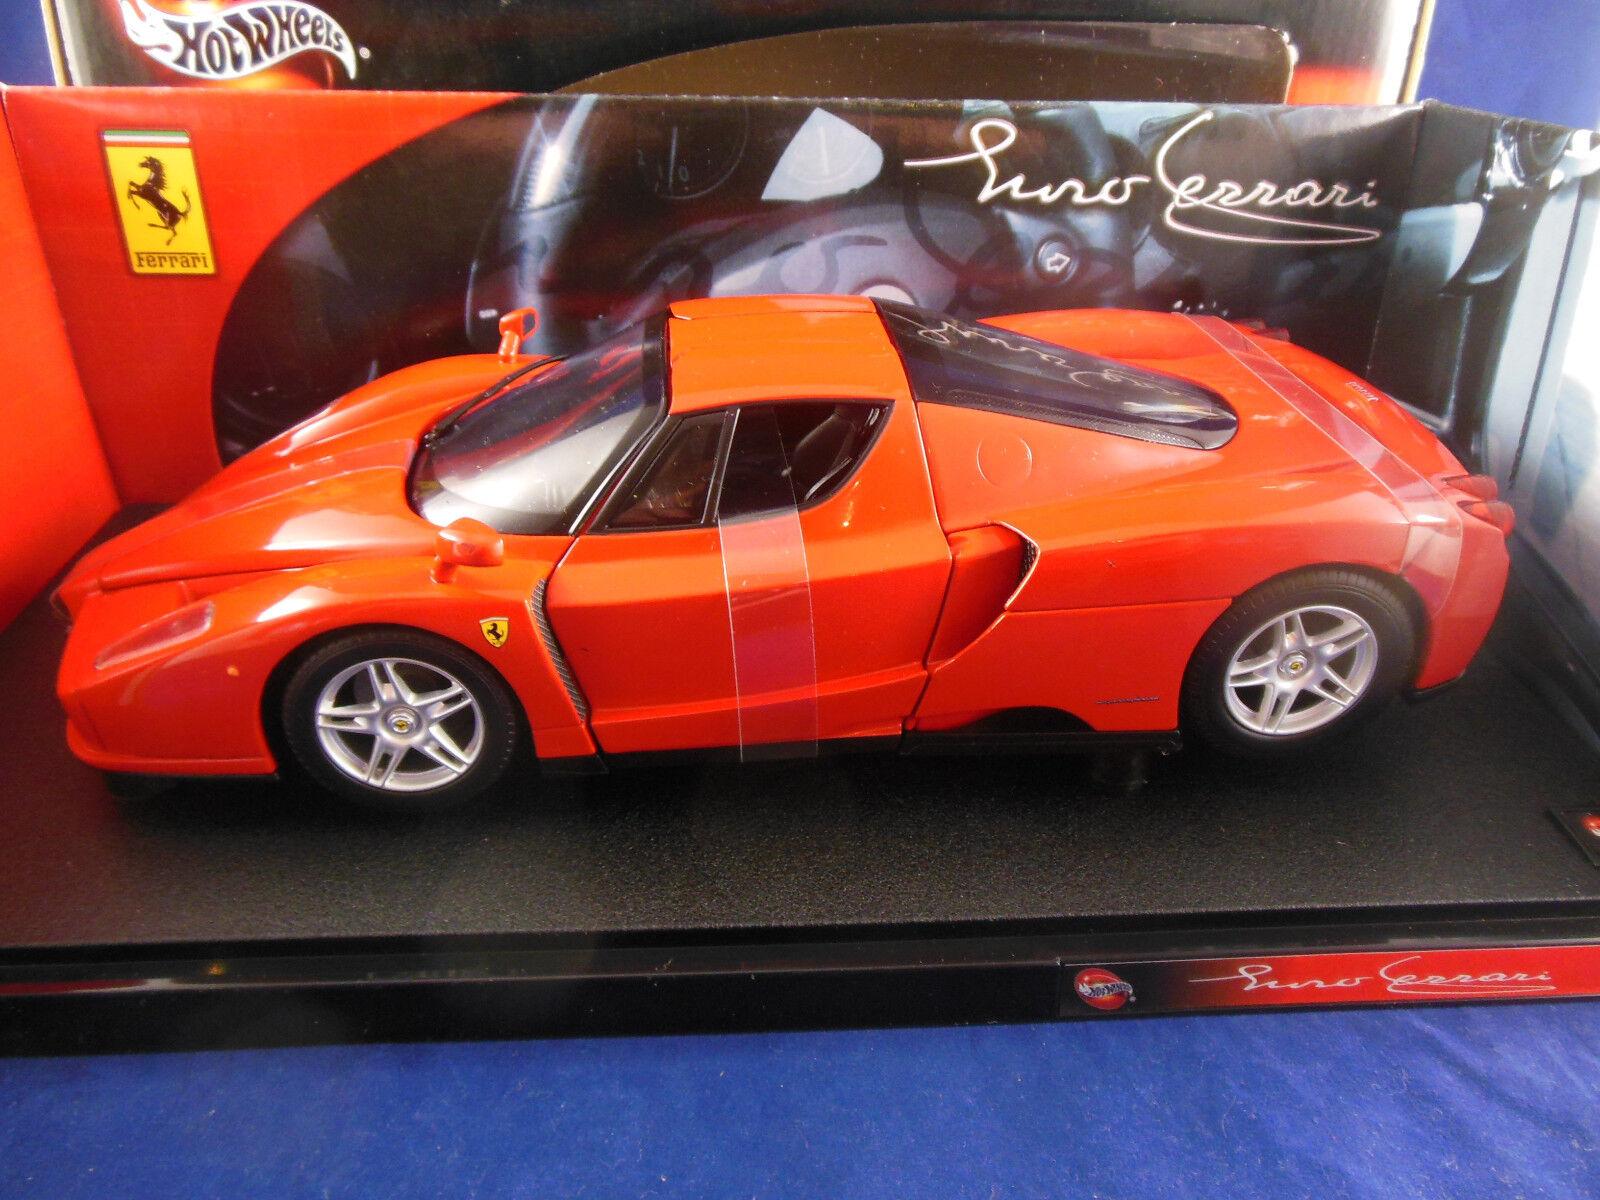 Hot Wheels 56293 Ferrari Enzo in red 1 18 Scale